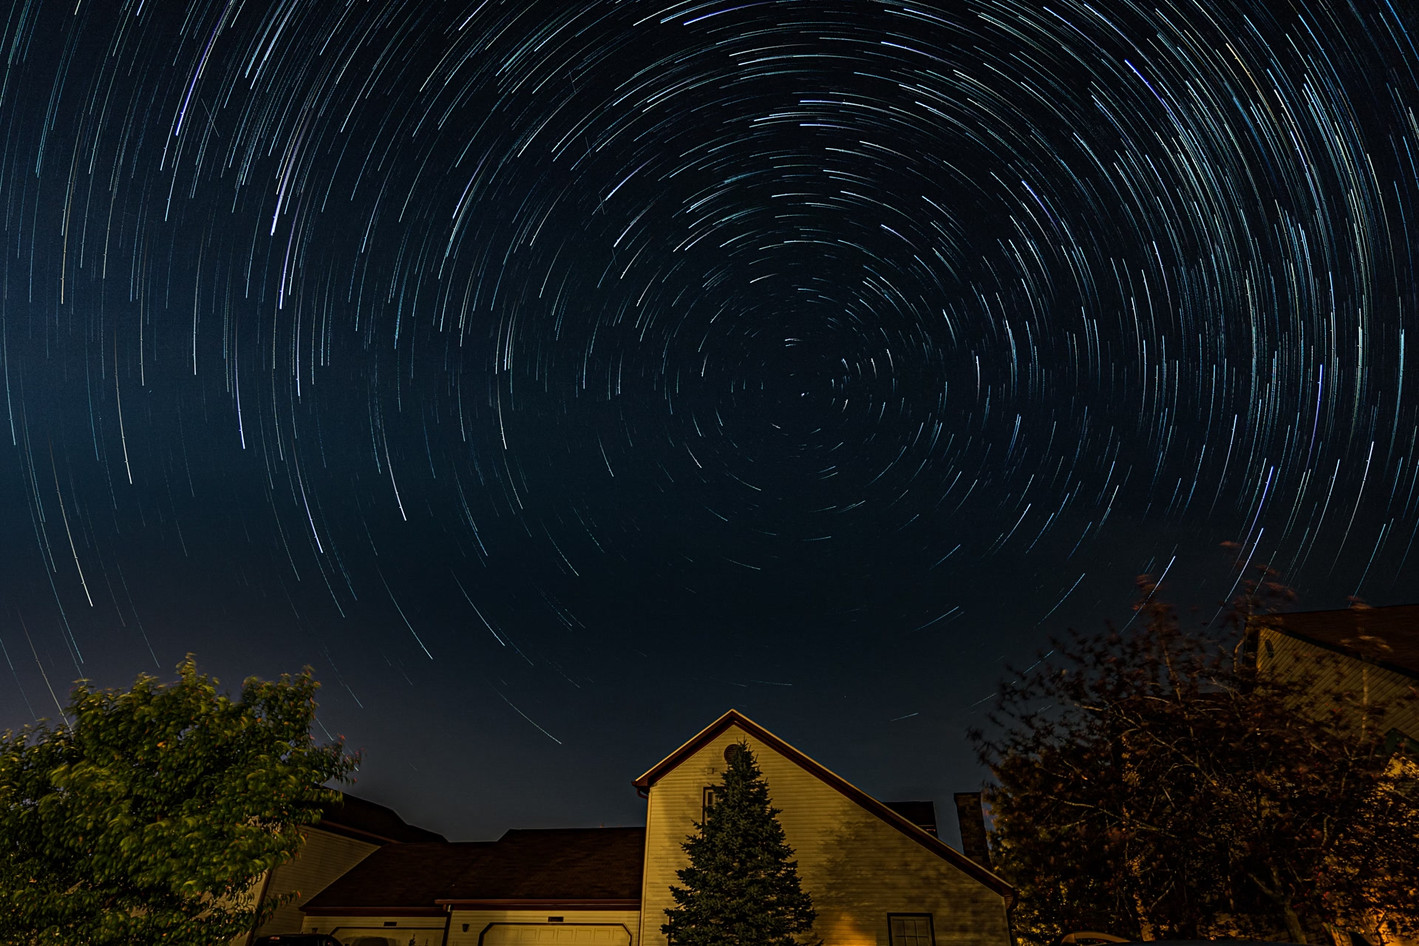 starstax2_h264-420_1080p_30_MQ.mp4